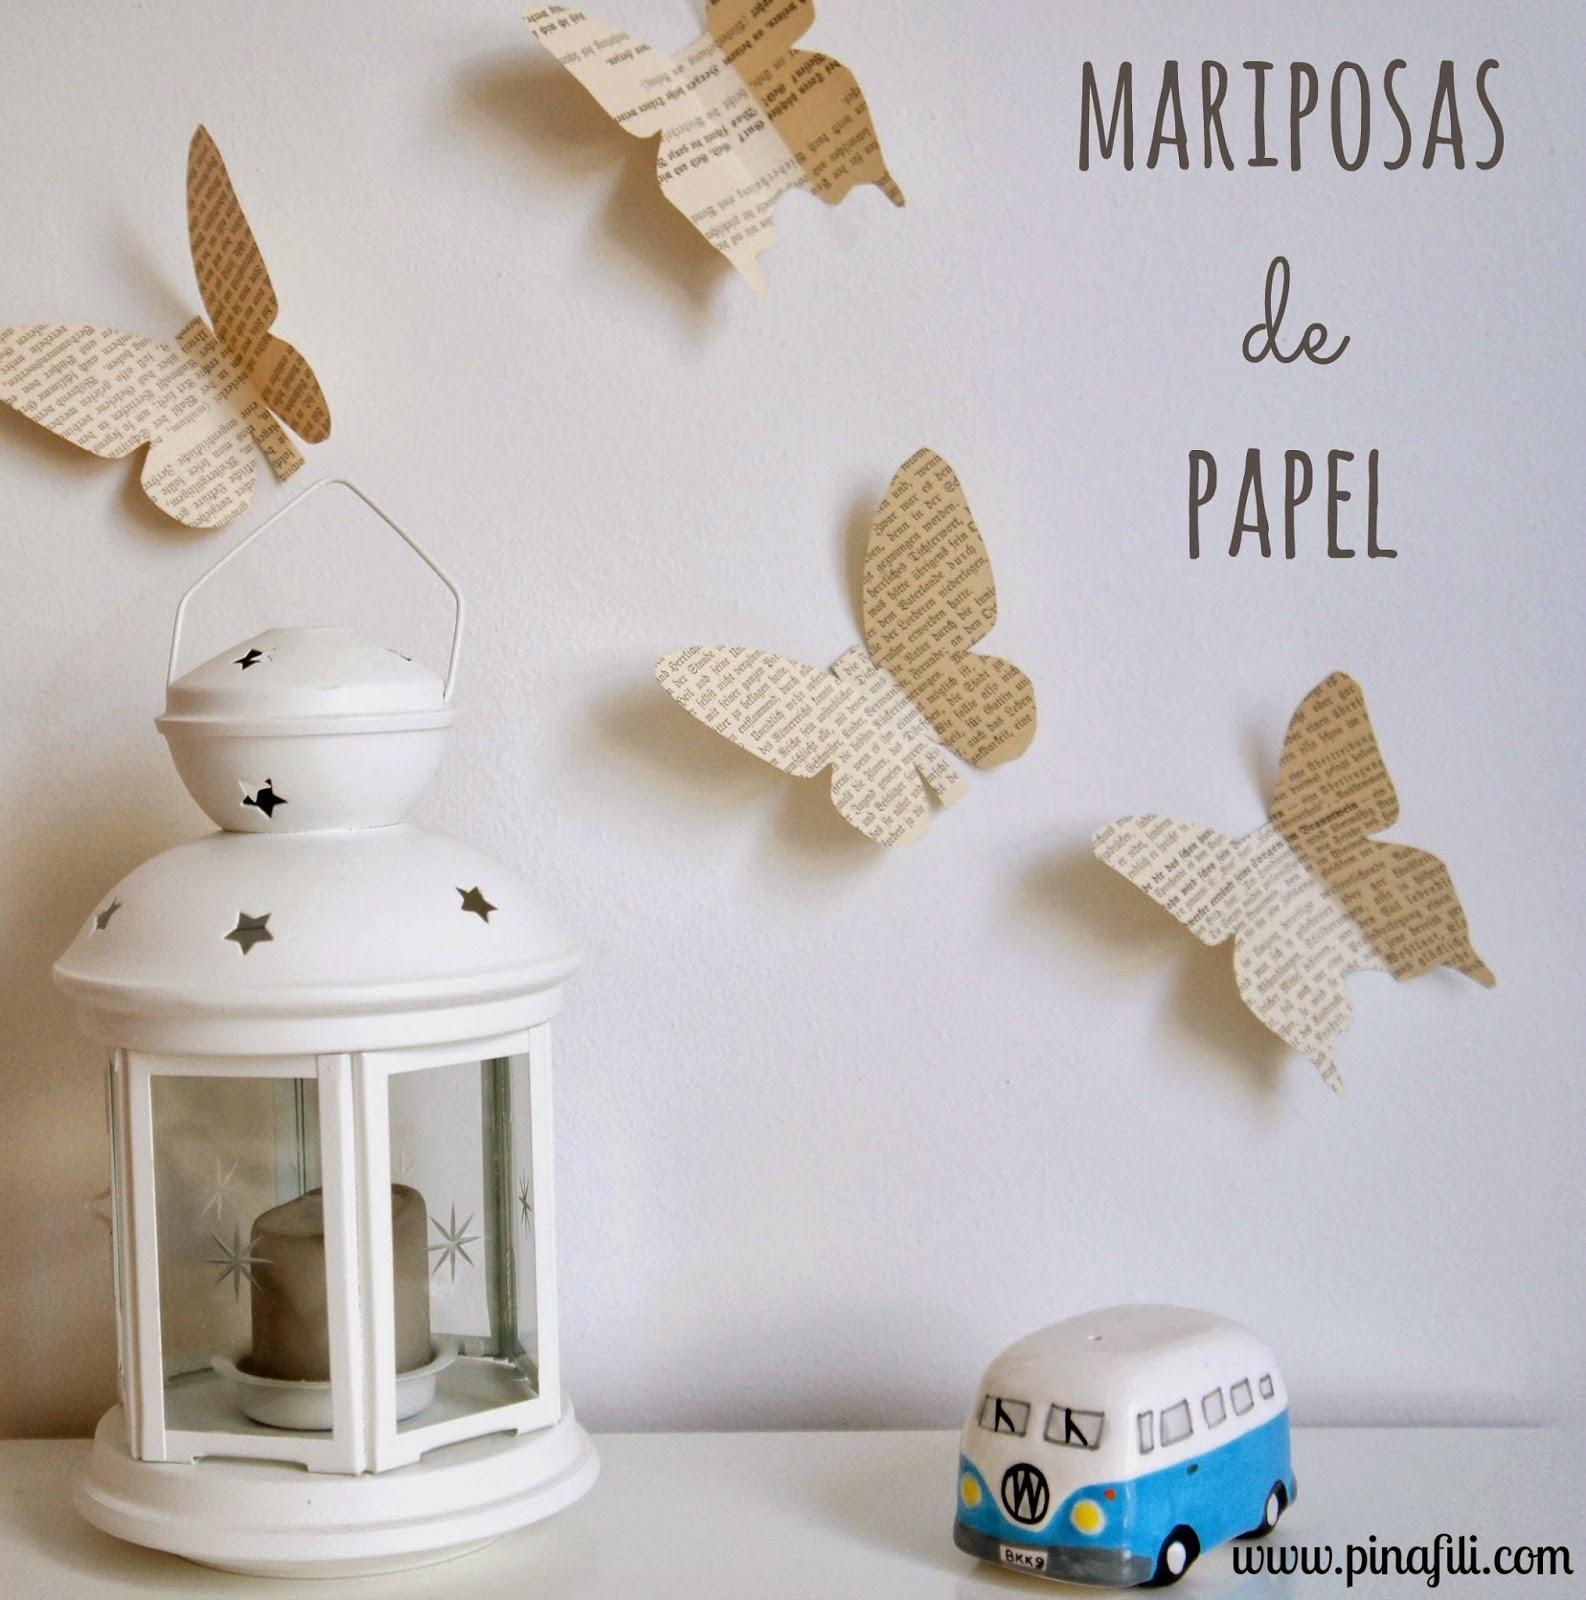 Pinafili diy mariposas de papel para decorar - Manualidades de papel para decorar ...